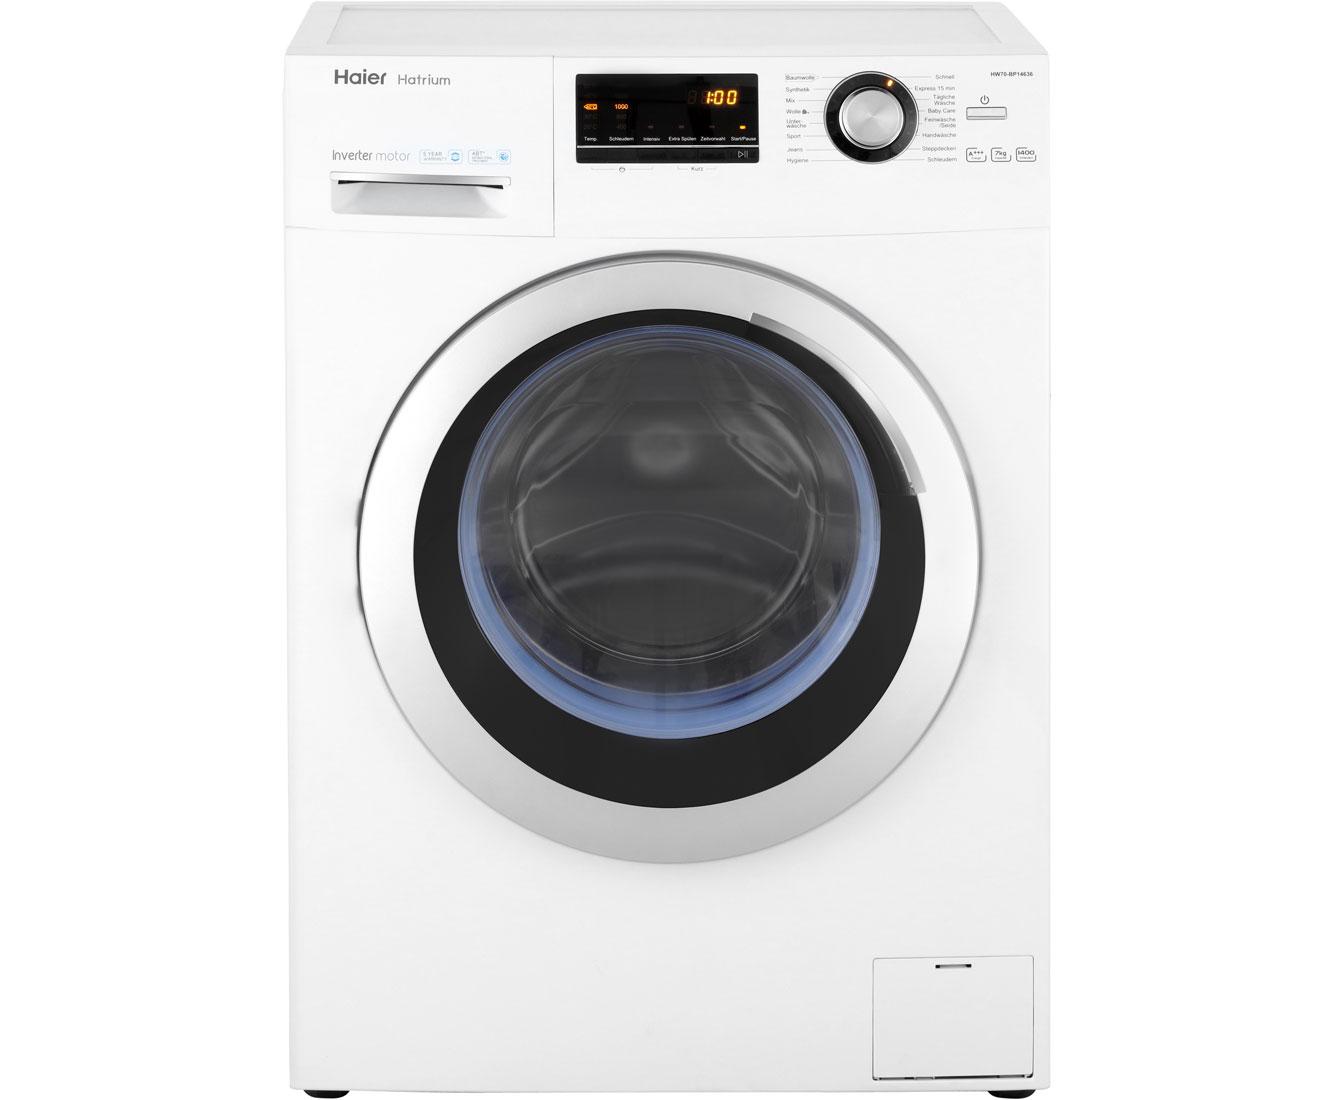 Haier HW70-BP14636 Waschmaschine, 7 kg, 1400 U/Min, A+++